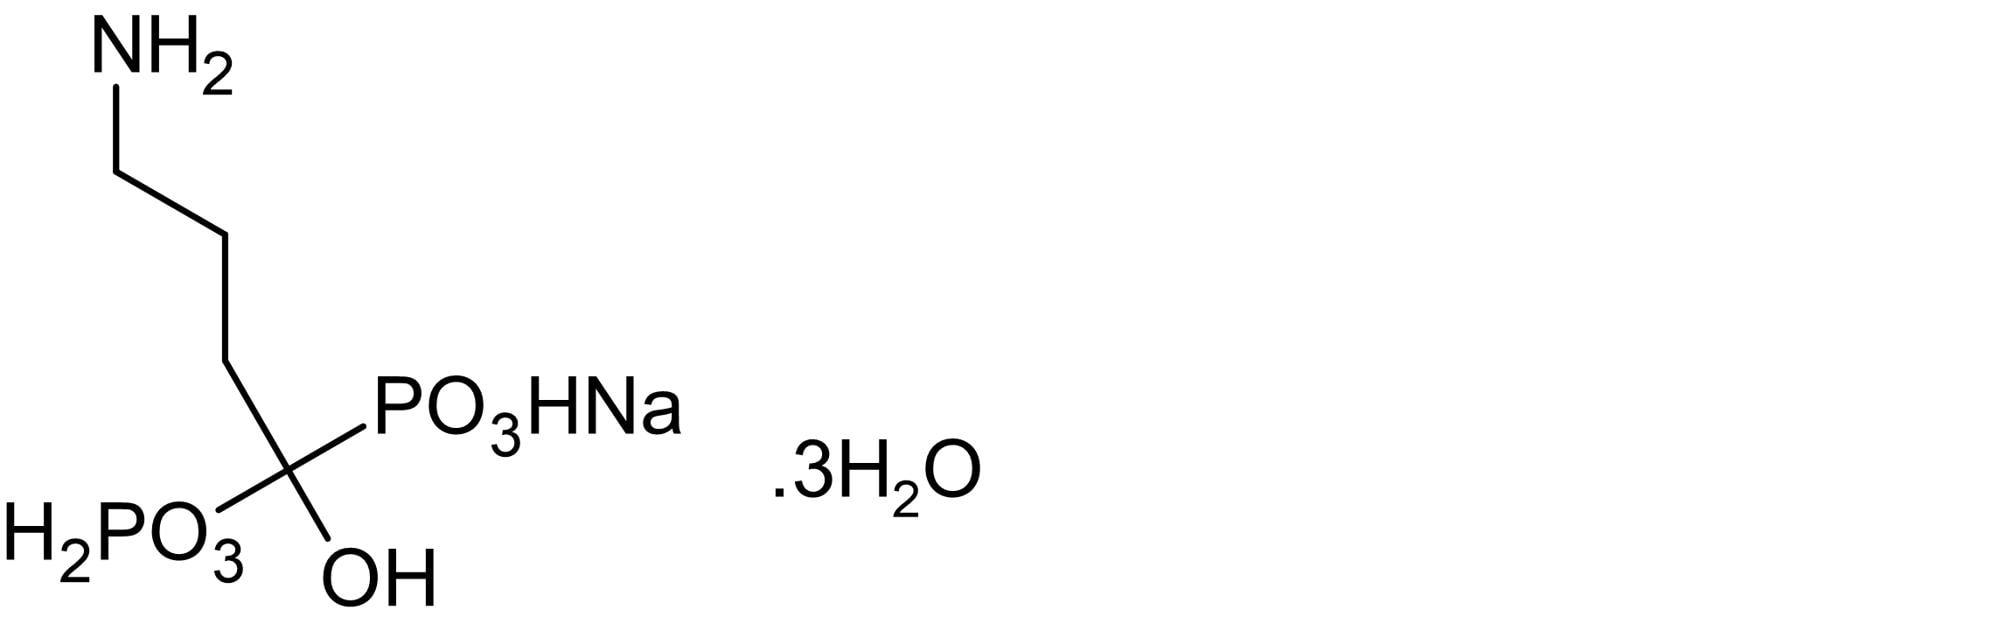 Chemical Structure - Alendronate monosodium trihydrate, bone resorption inhibitor (ab141897)